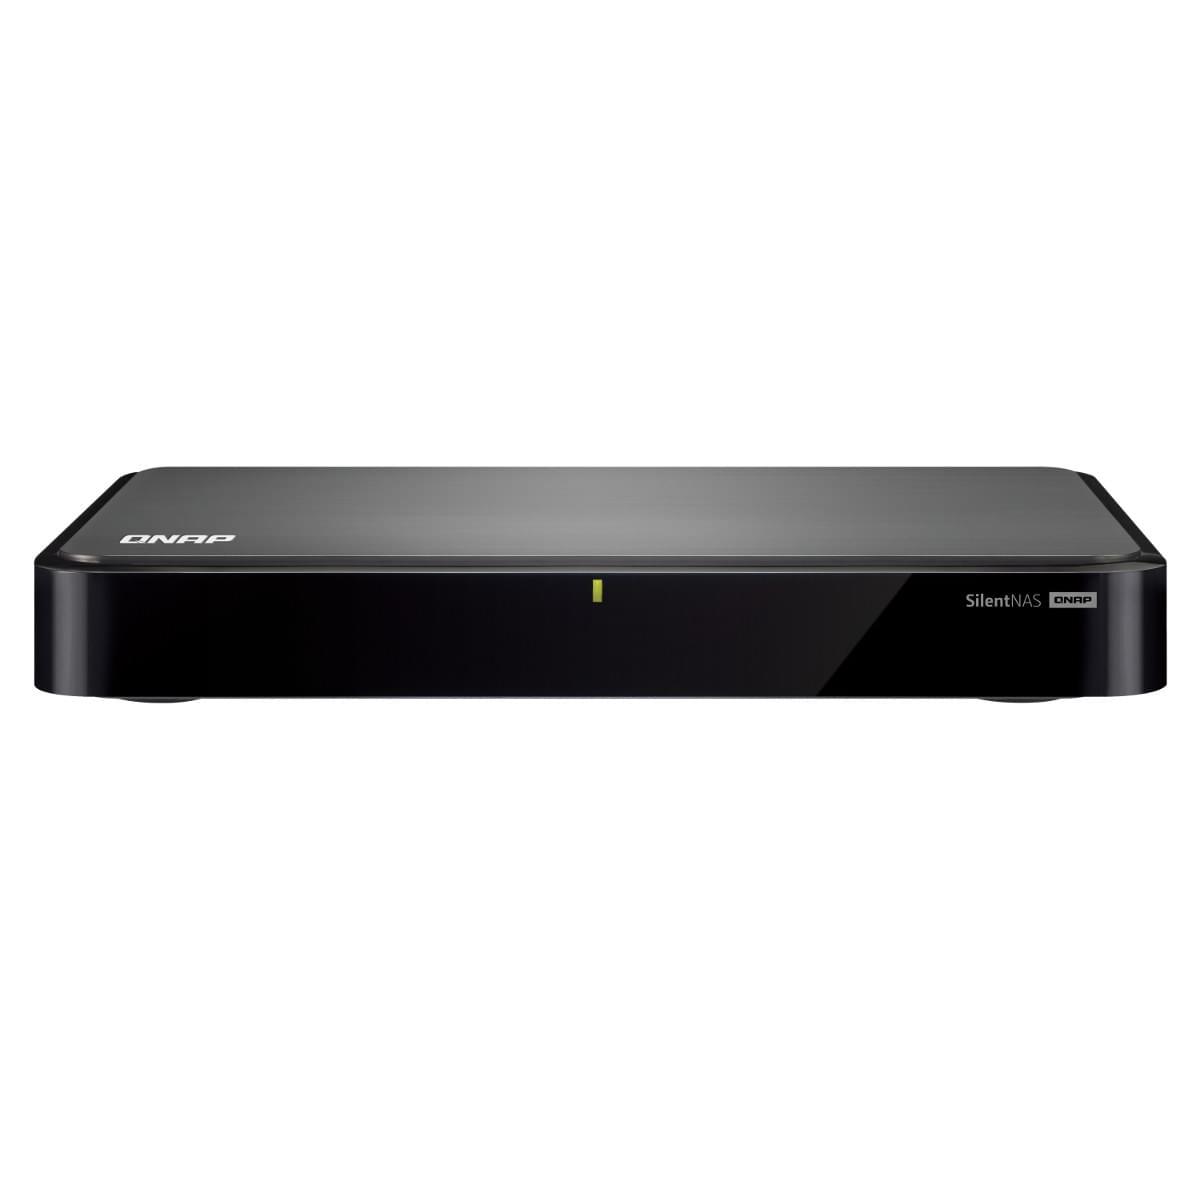 Qnap HS-210 silencieux - 2 HDD - Serveur NAS Qnap - Cybertek.fr - 0